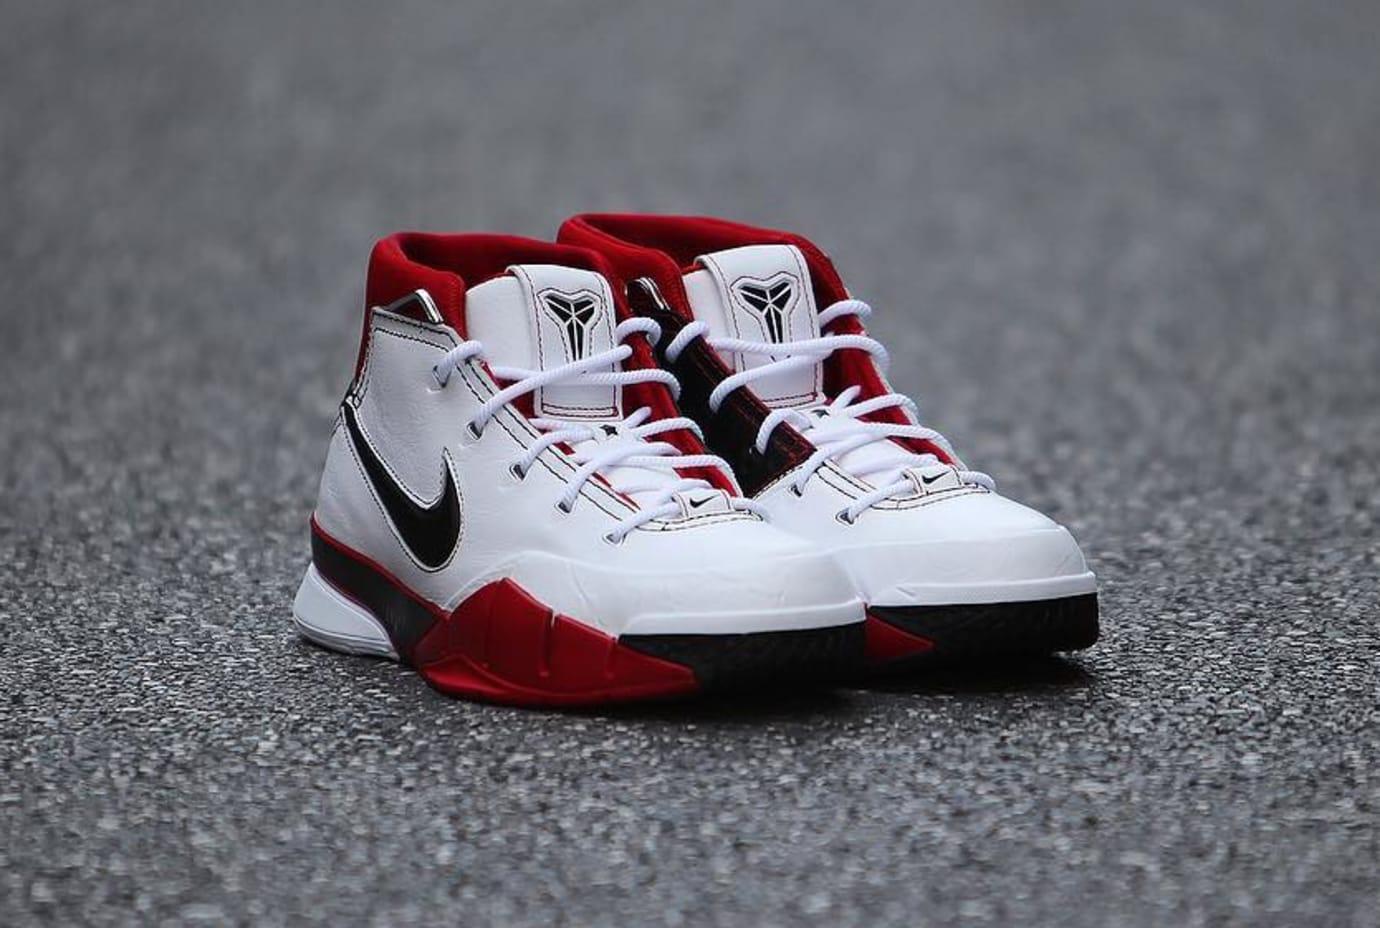 Nike Zoom Kobe 1 Protro All-Star Release Date AQ2728-102 Toe